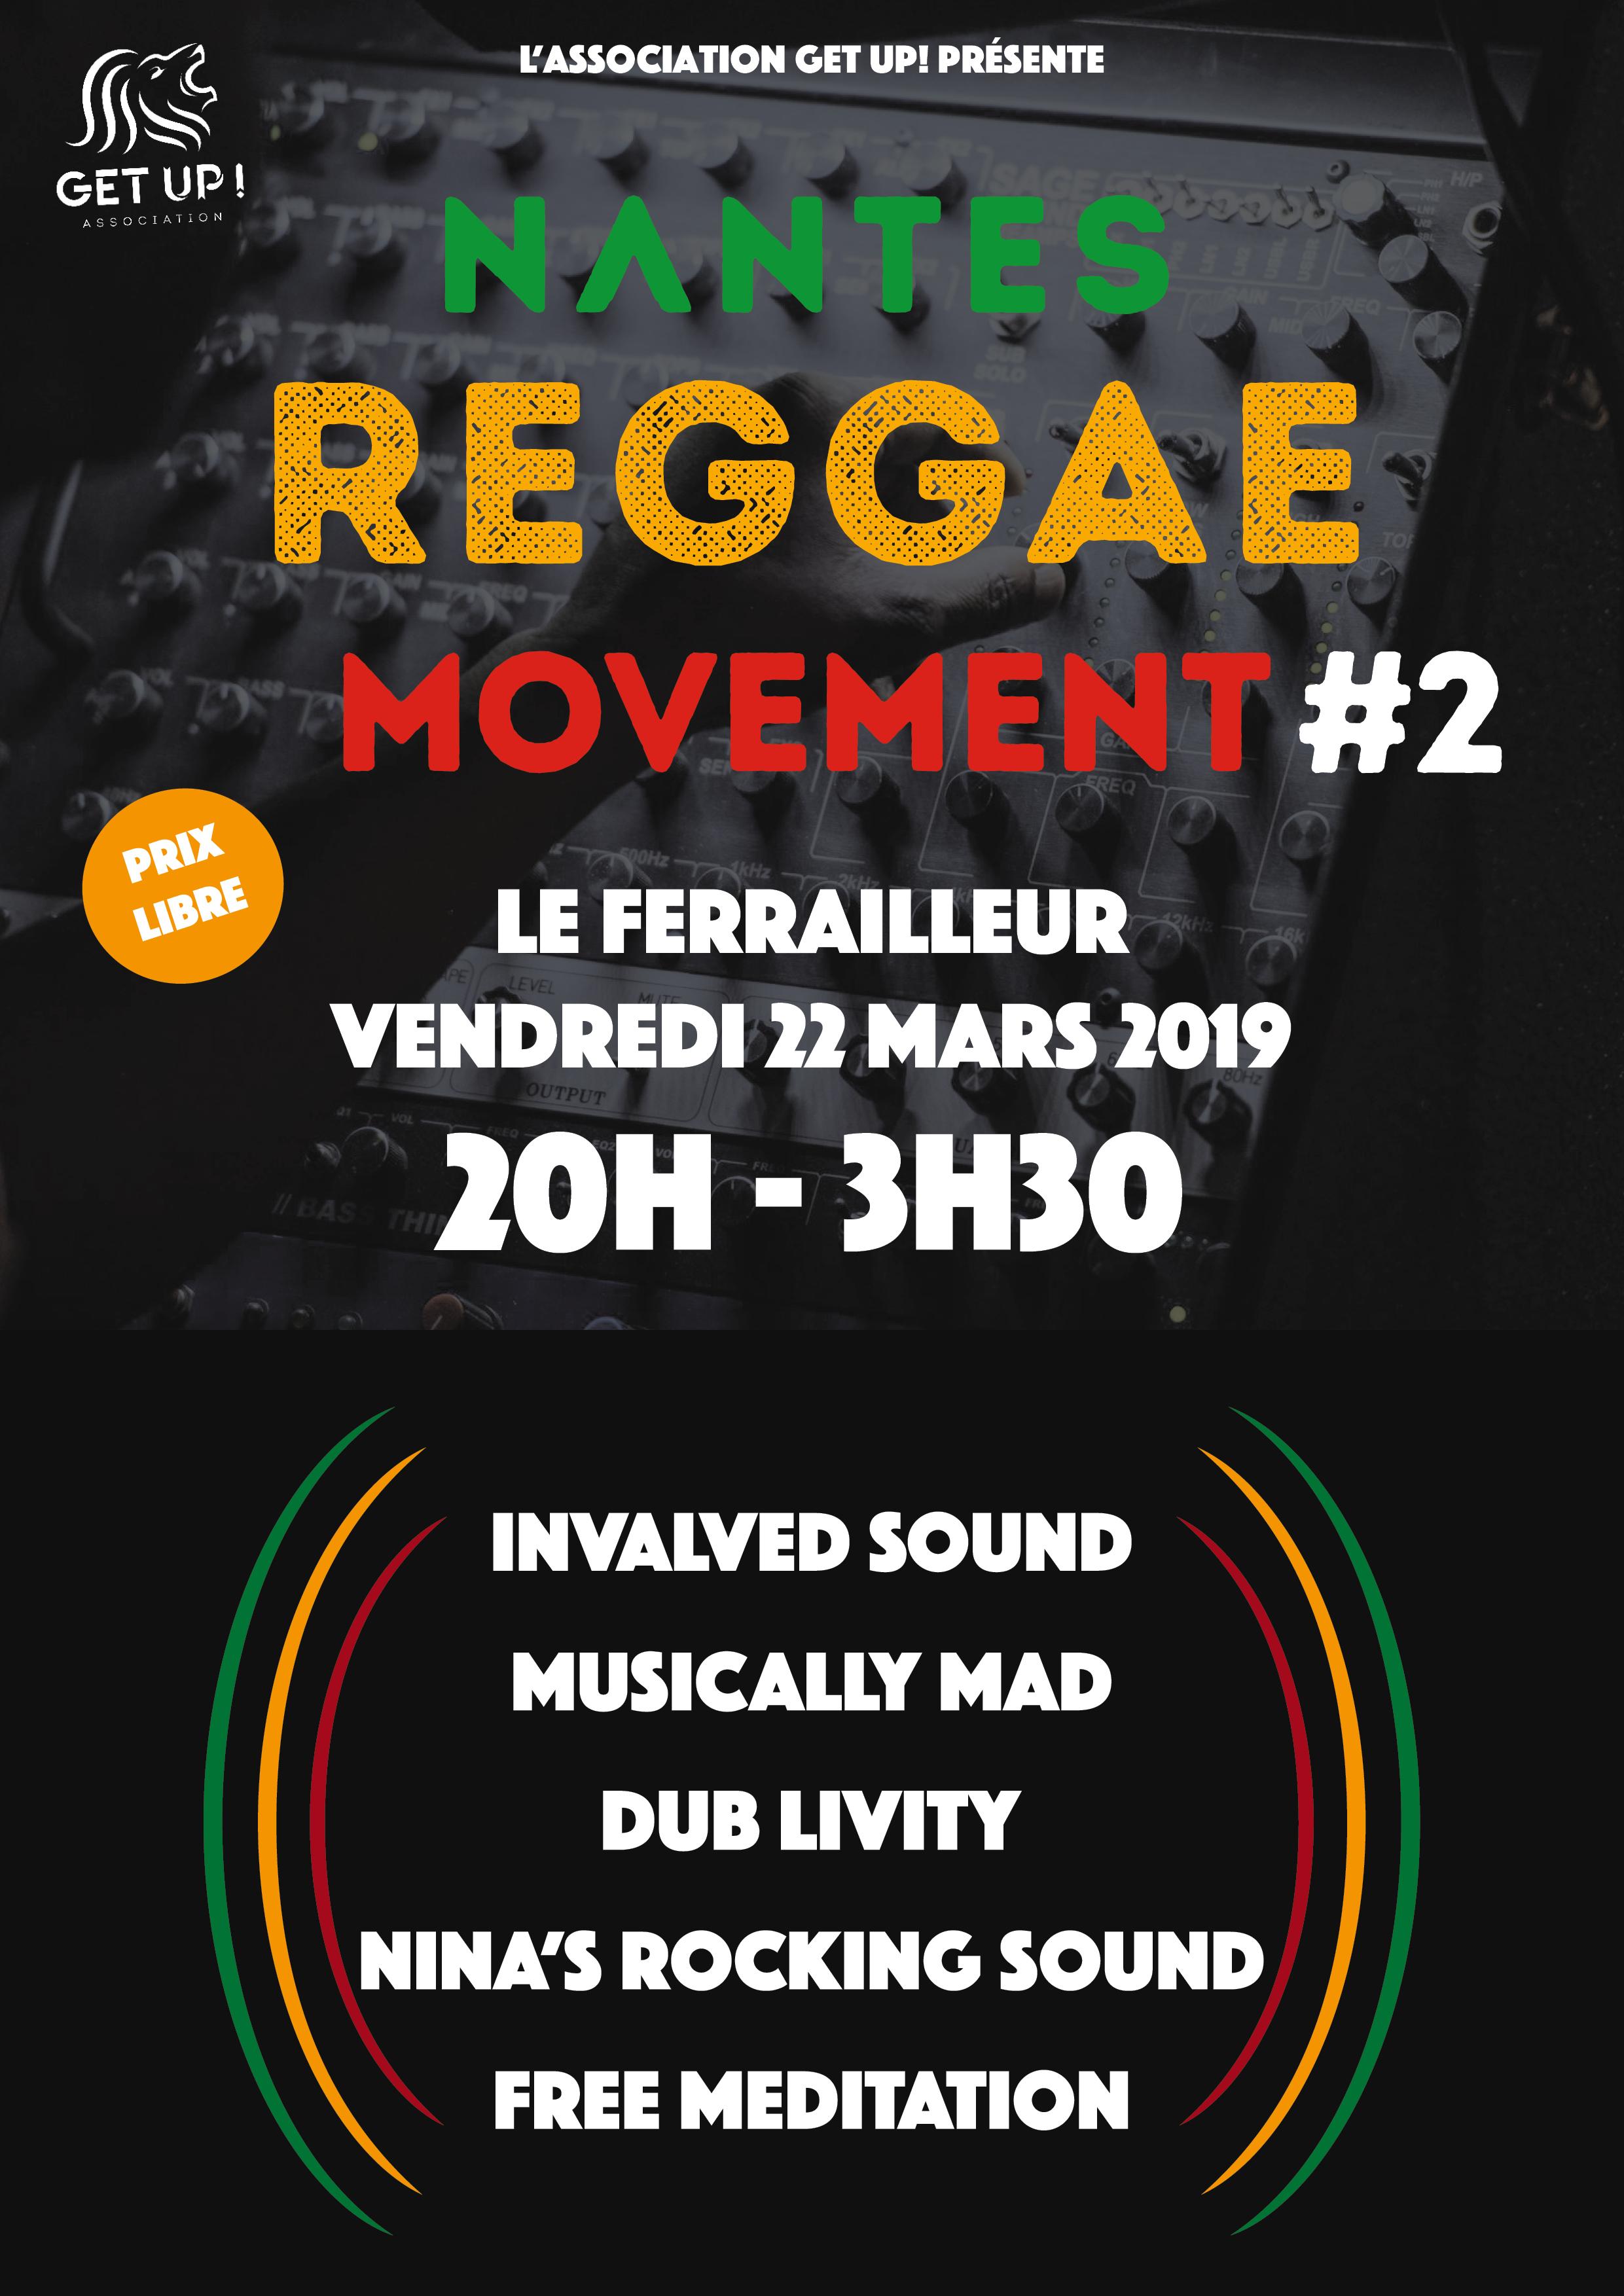 40x60 - visuel - nantes reggae mouvement 2 V2